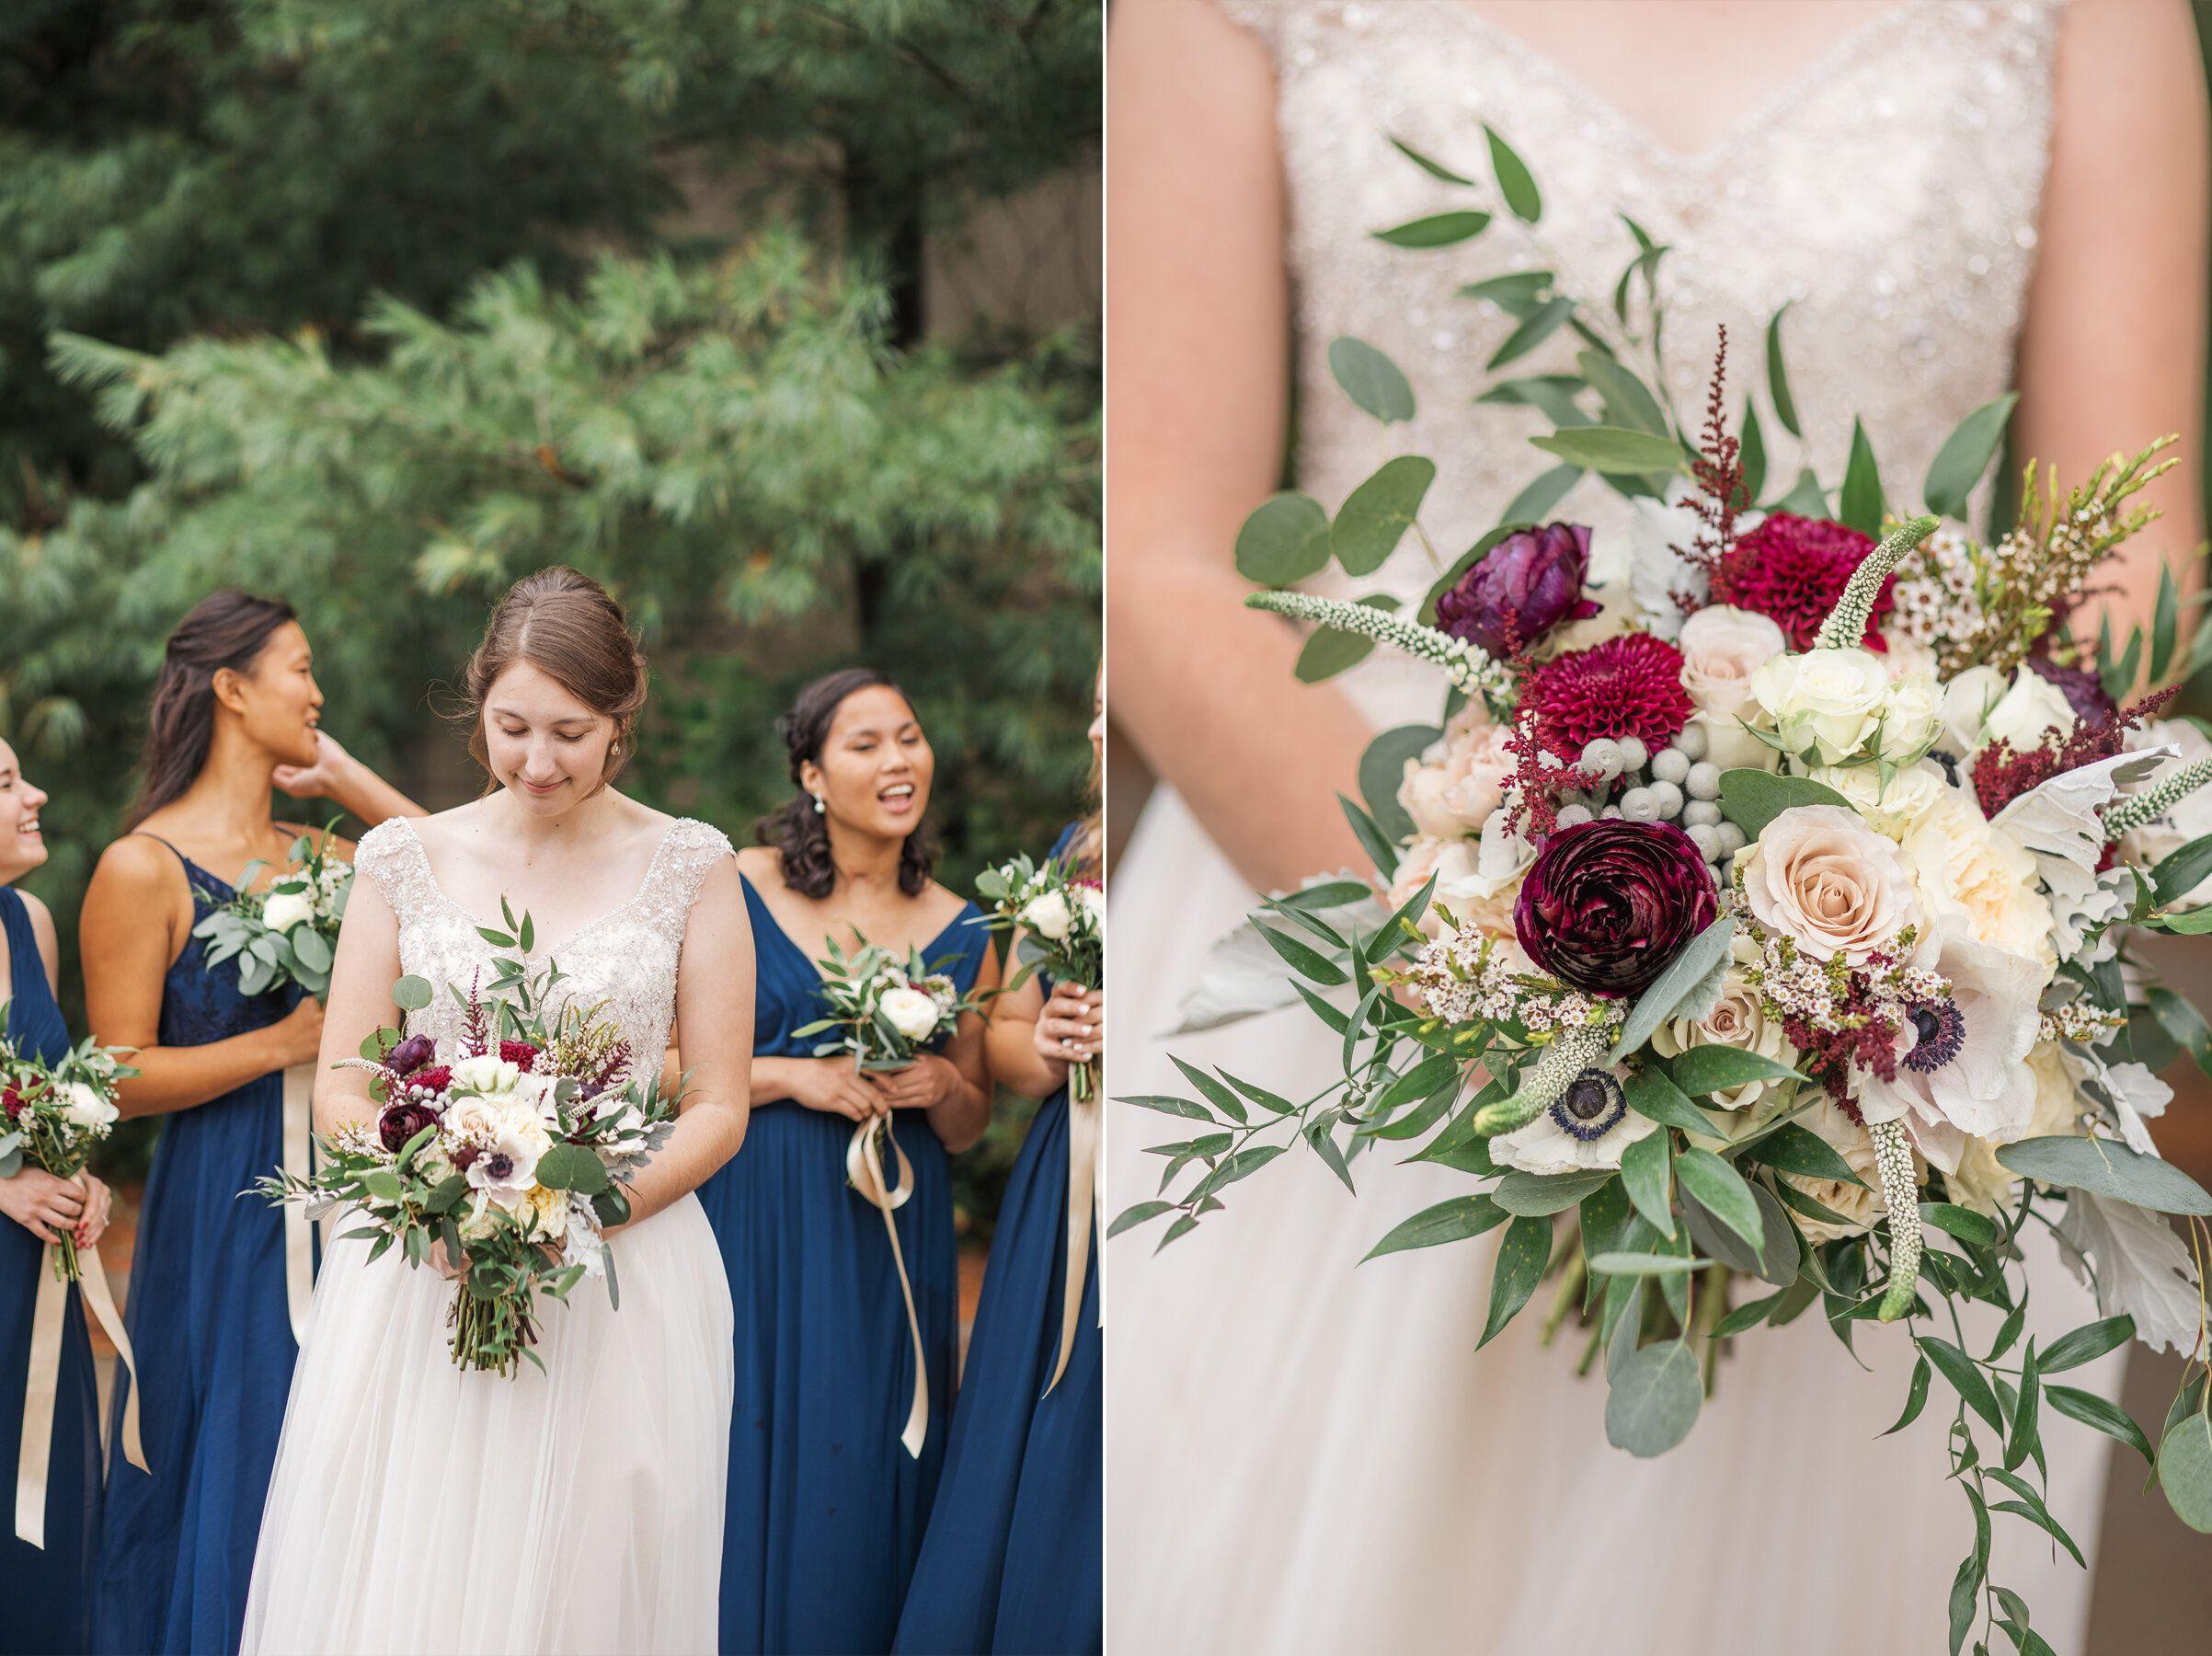 Brian Rebekah Ames Wedding Photographers Wedding Primitive